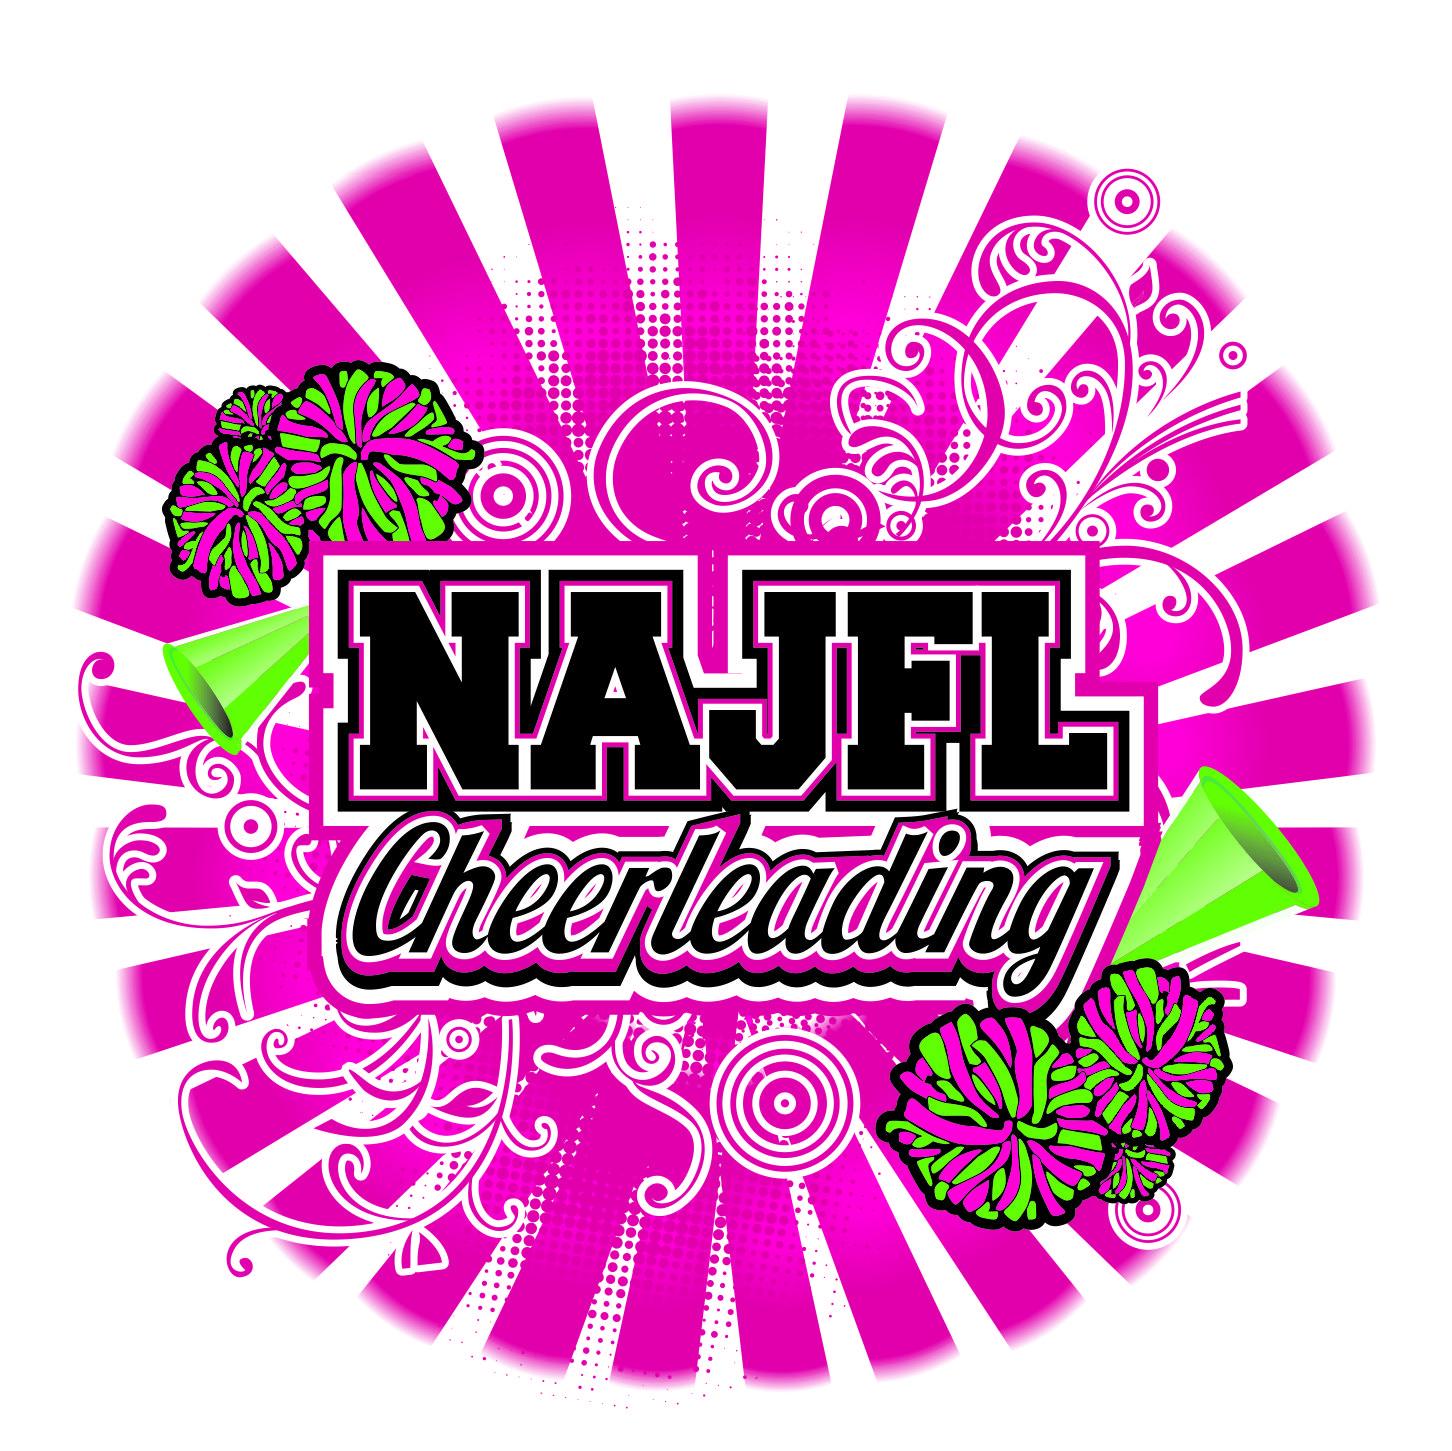 cheer-logo